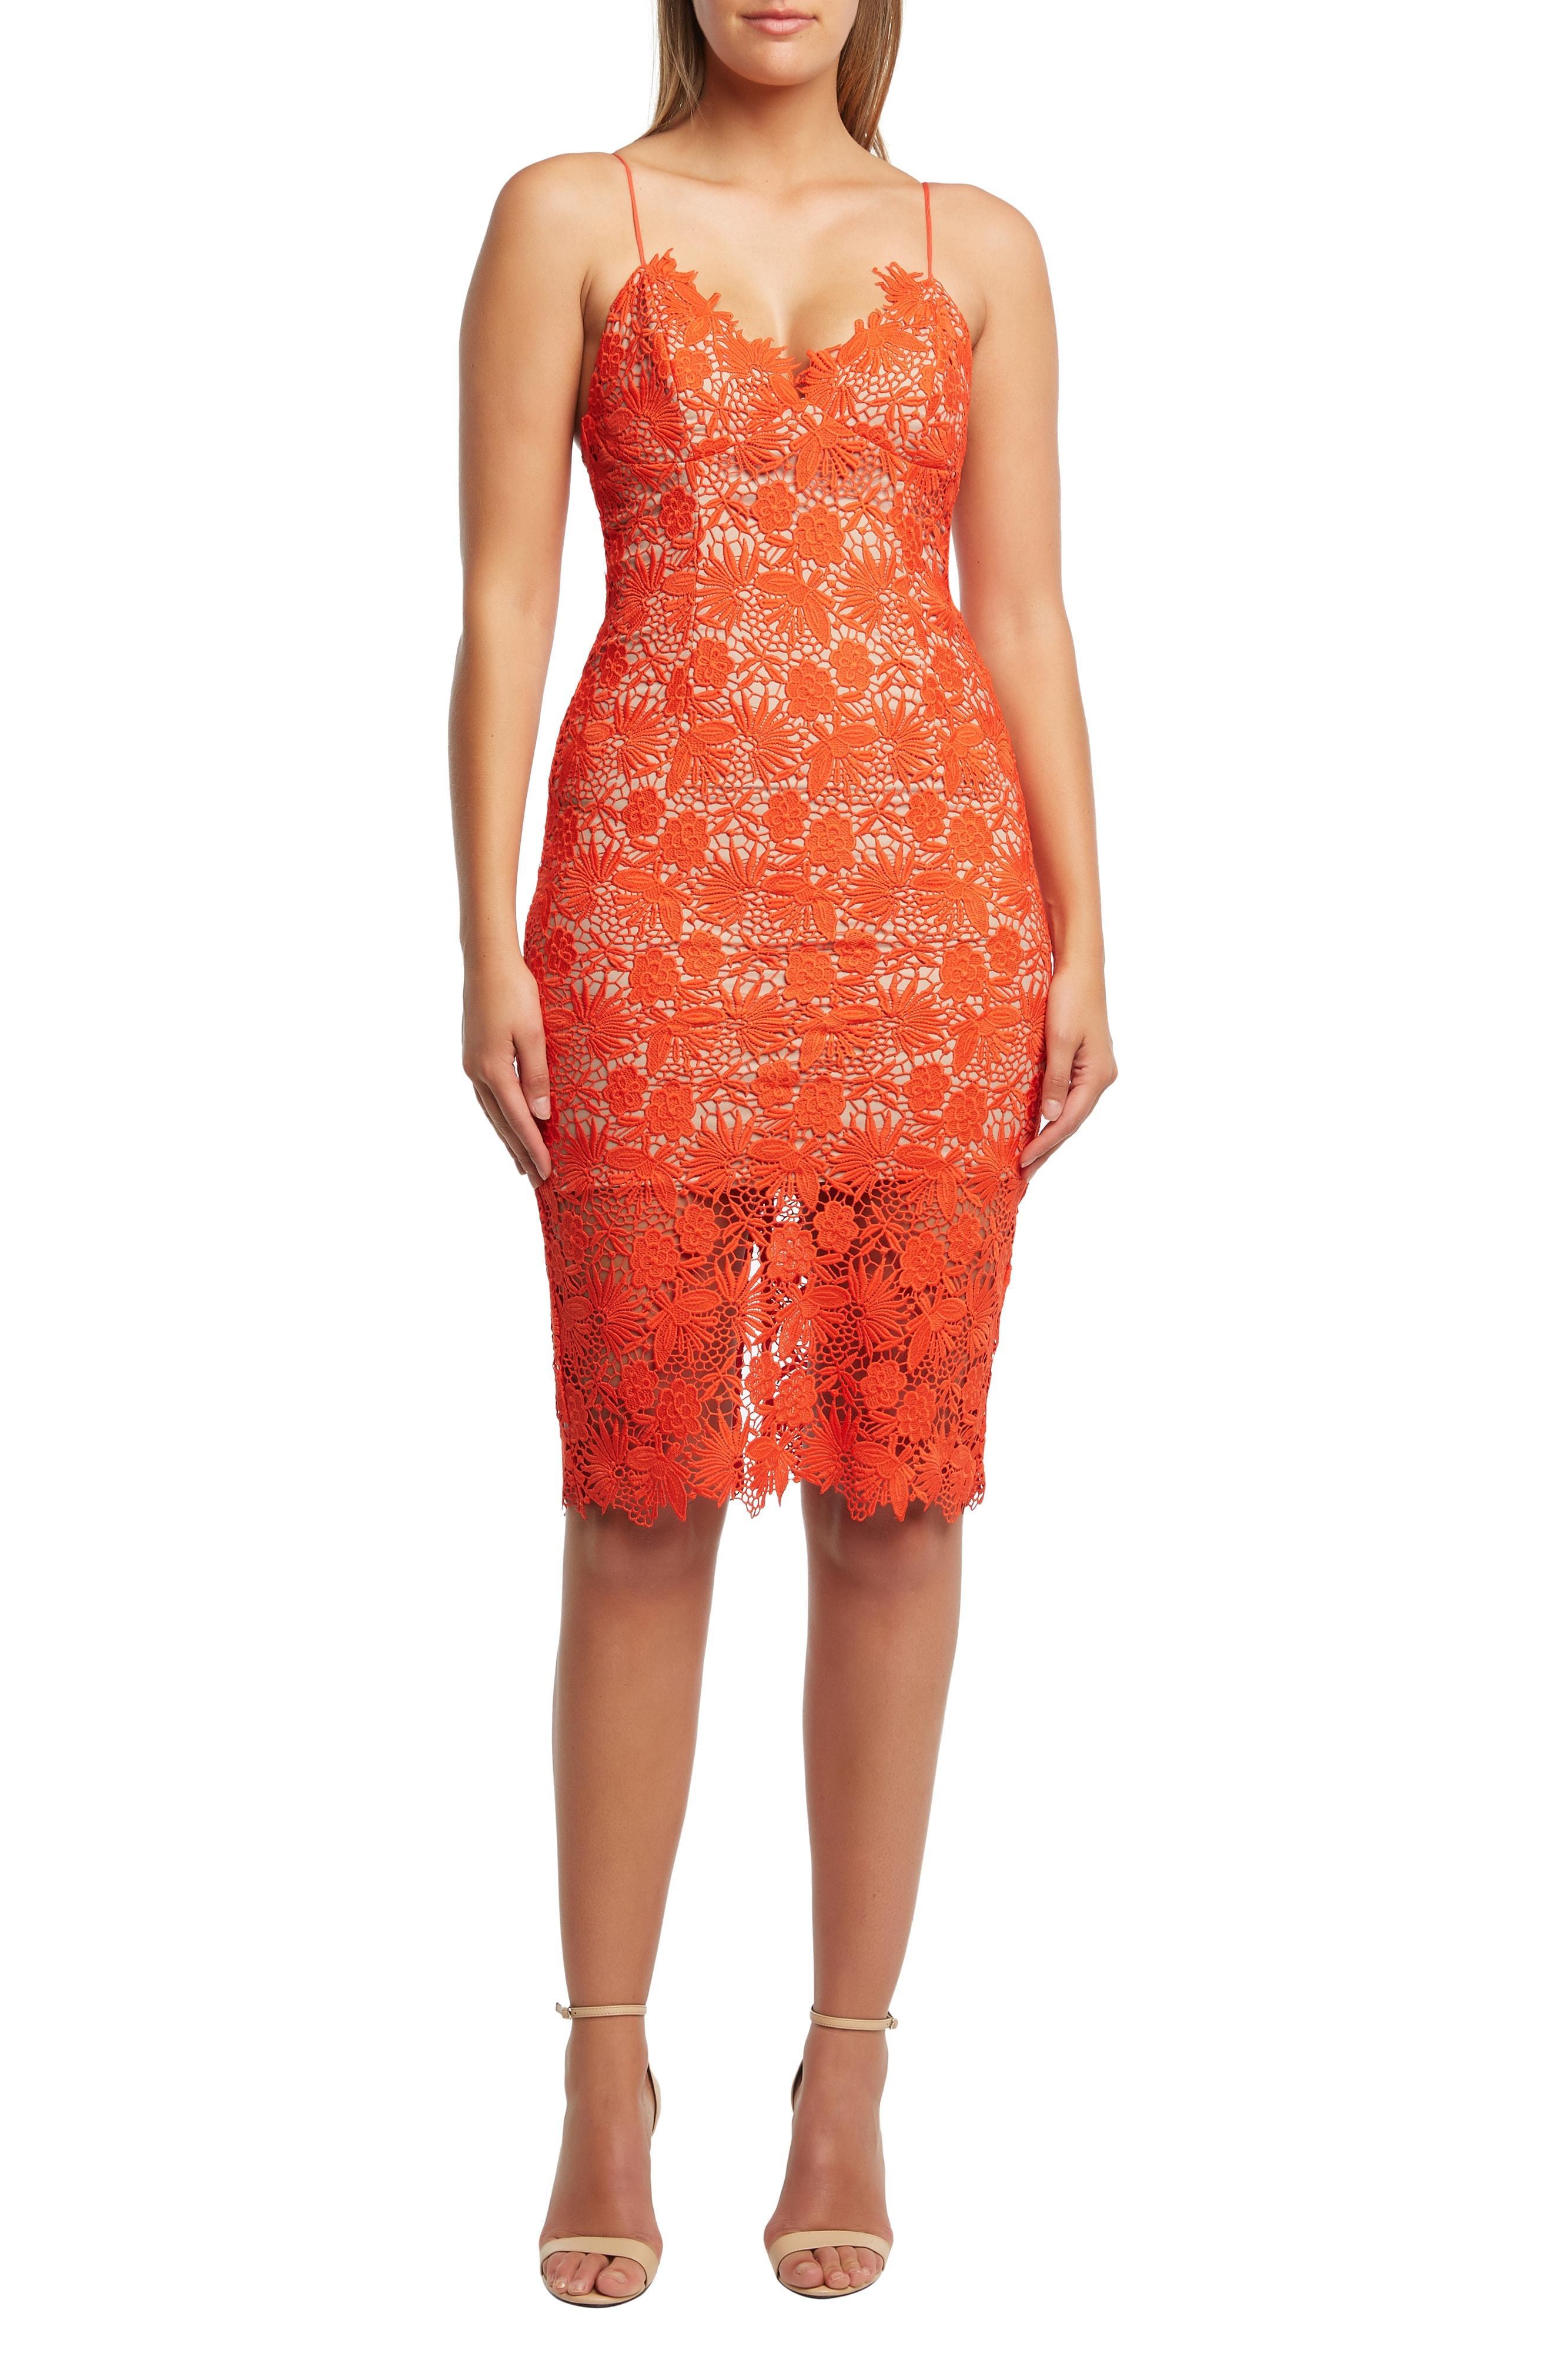 74d60dfbbc66 Lyst - Bardot Tayla Lace Cocktail Dress in Orange